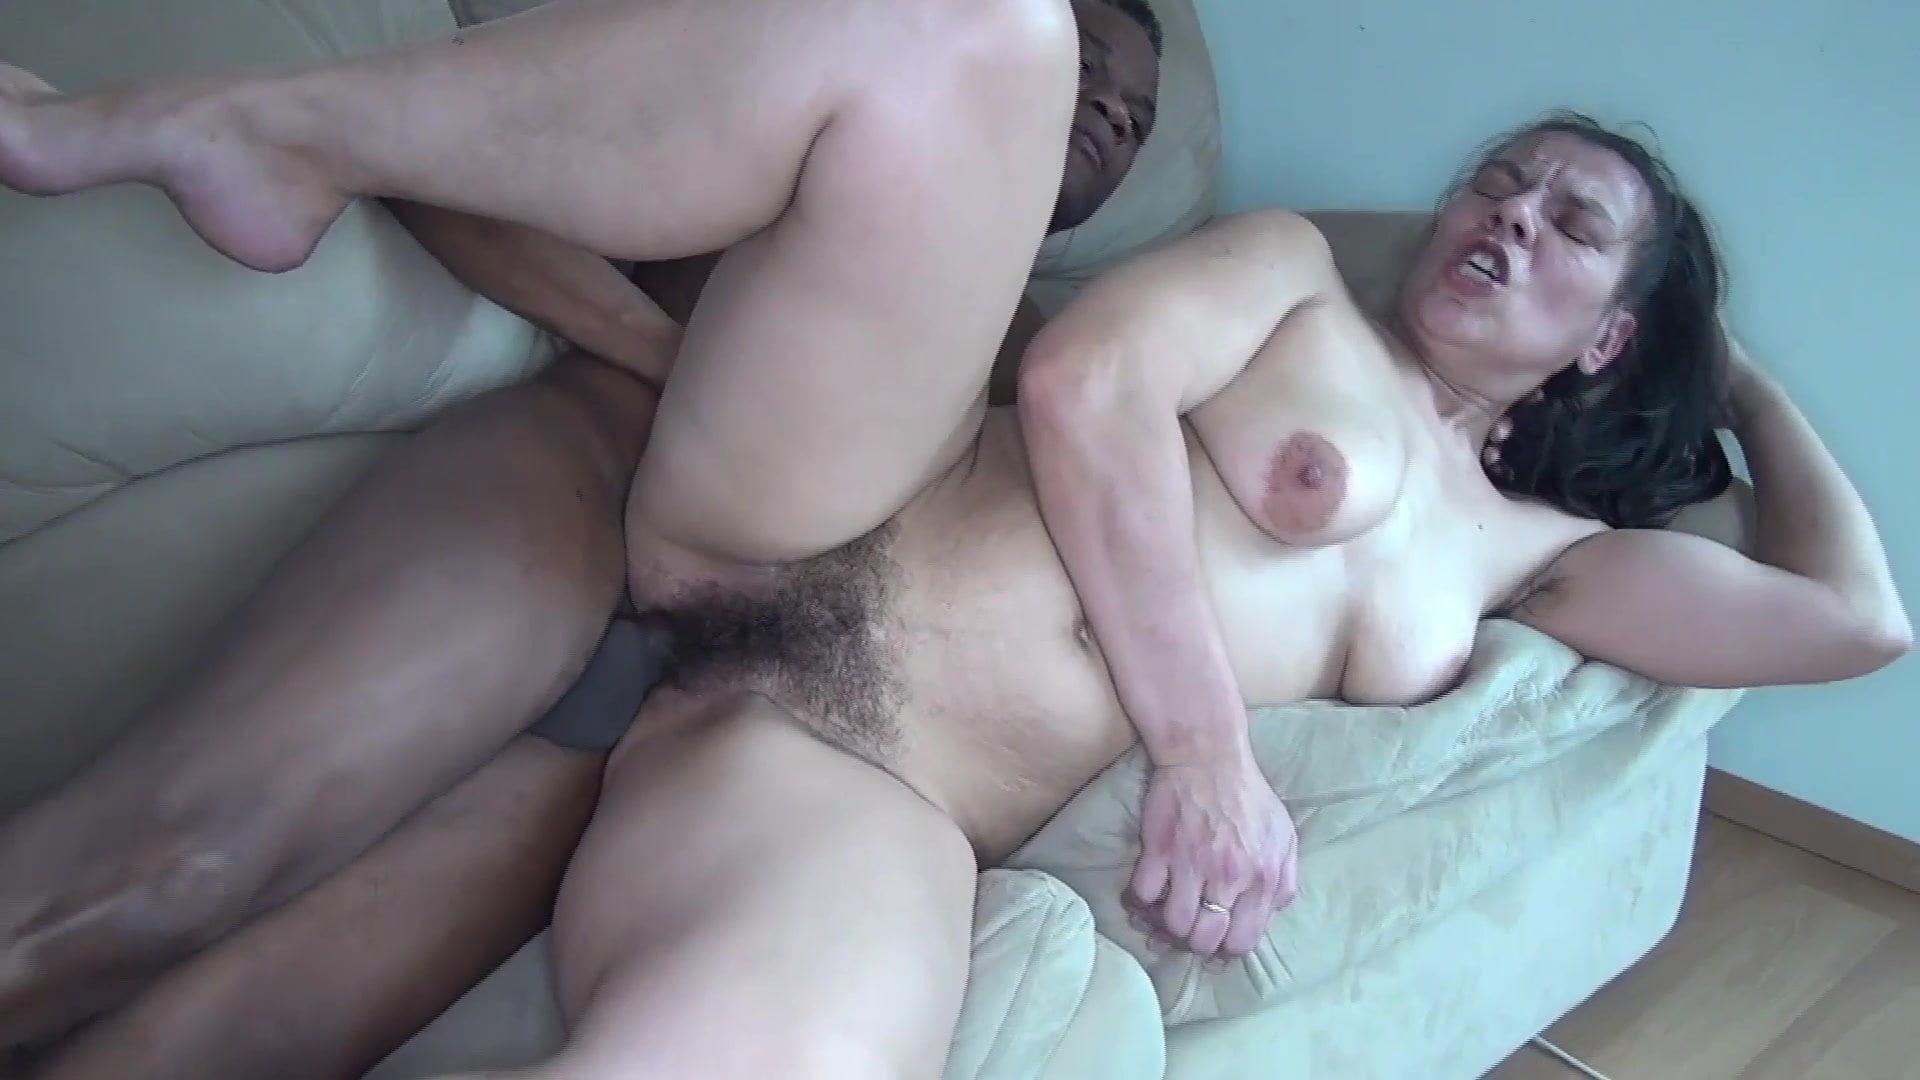 Porn pic Movie theaters porn nj